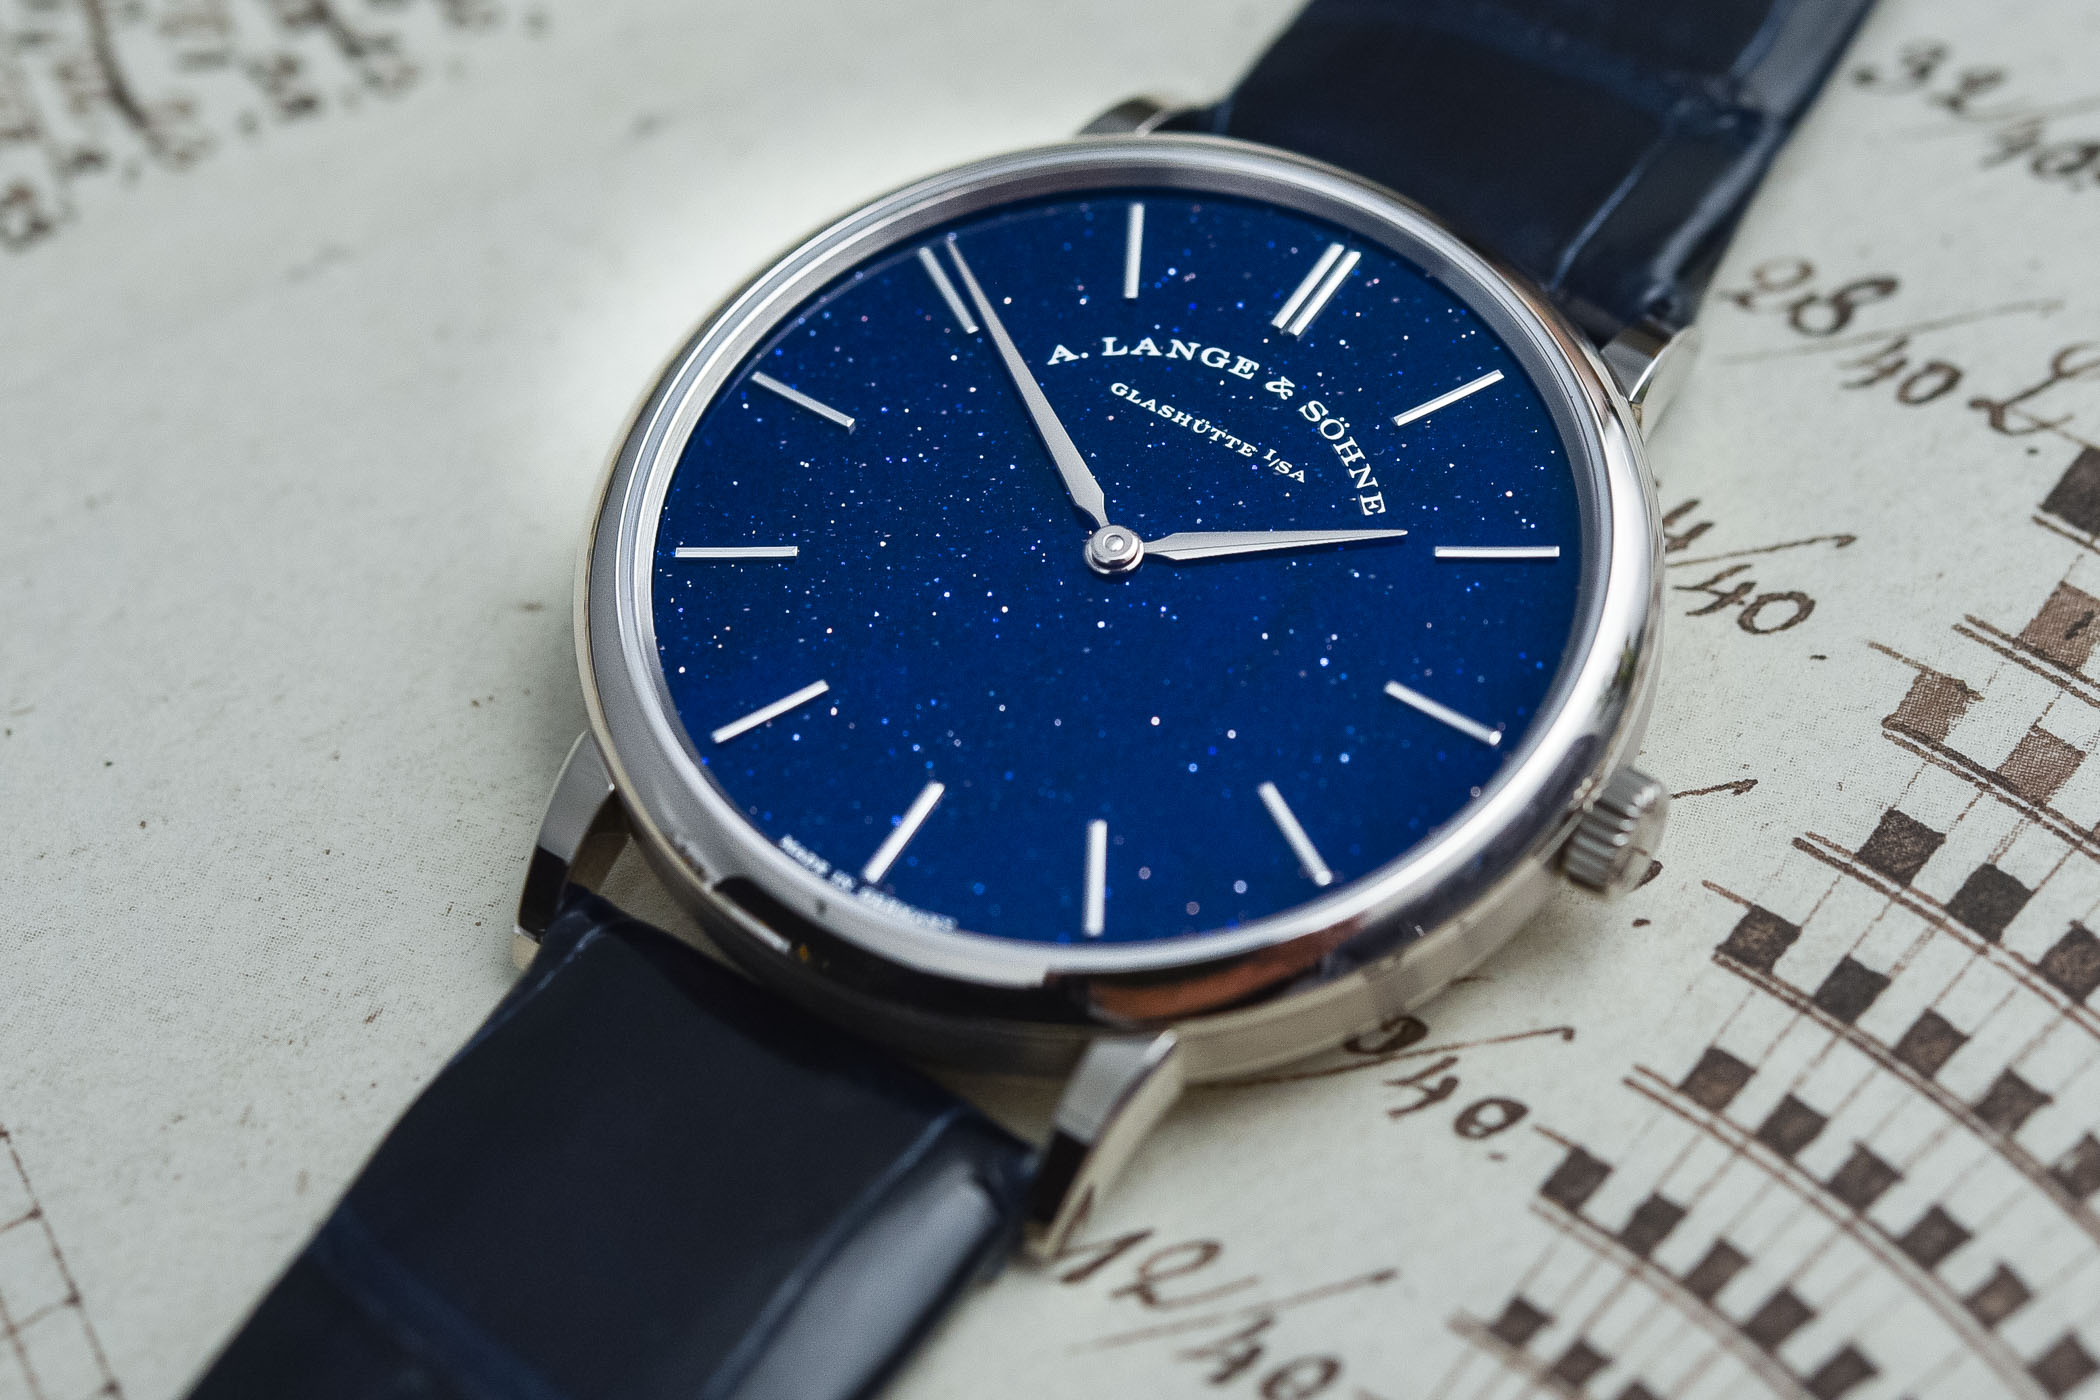 A. Lange & Söhne Saxonia Thin Copper-Blue Dial